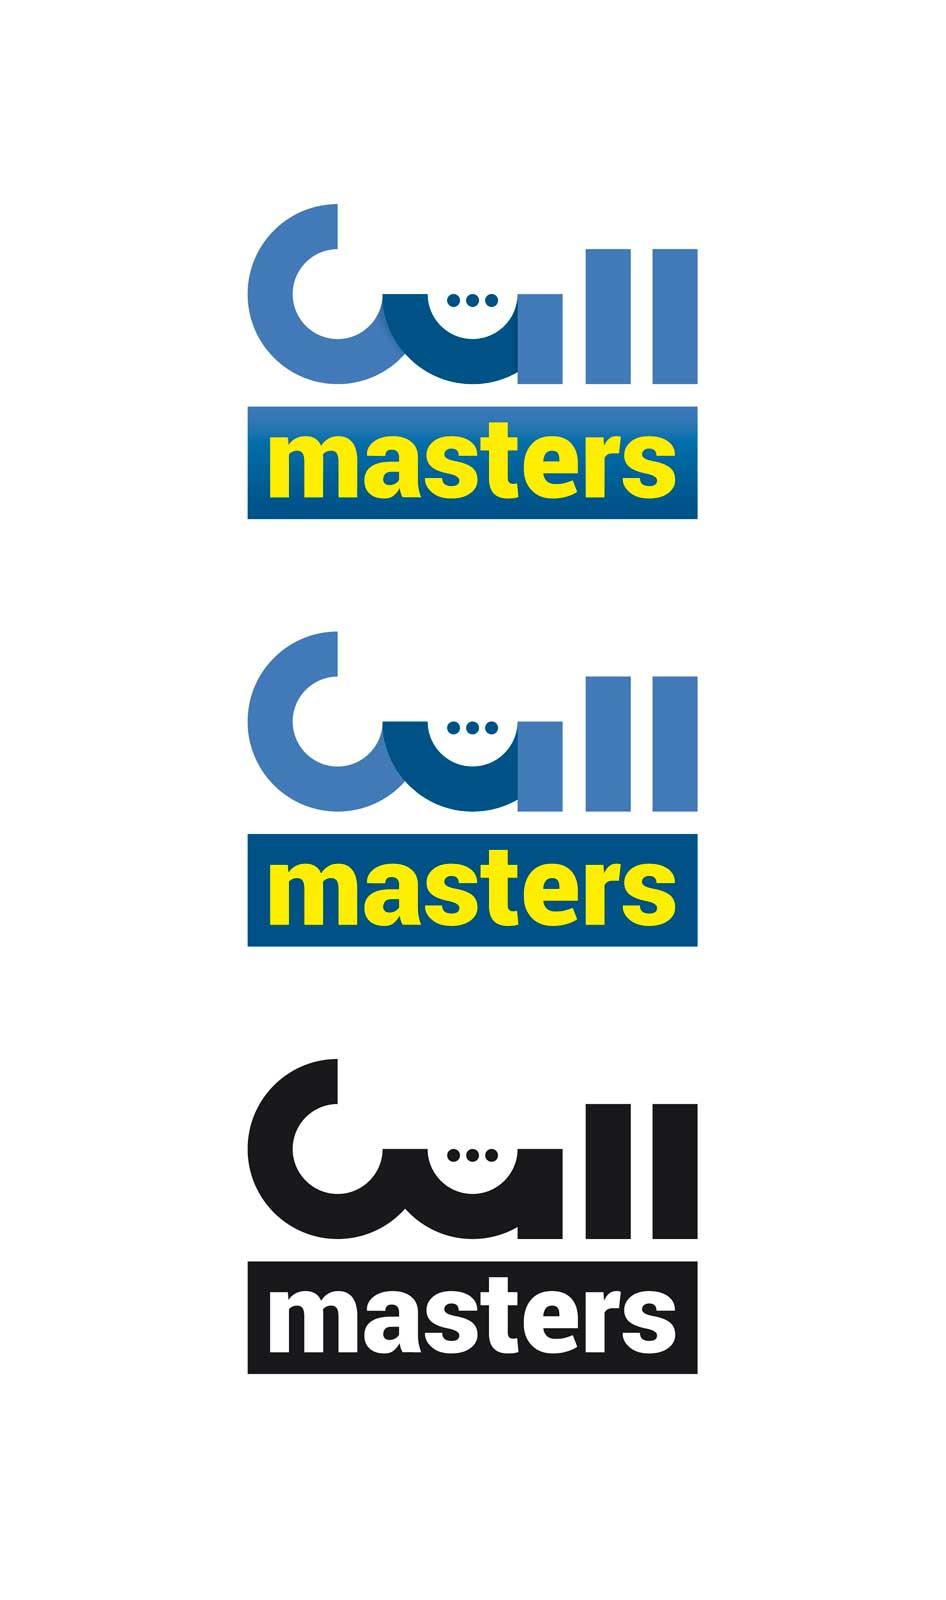 Логотип call-центра Callmasters  фото f_9955b72f2aae1230.jpg